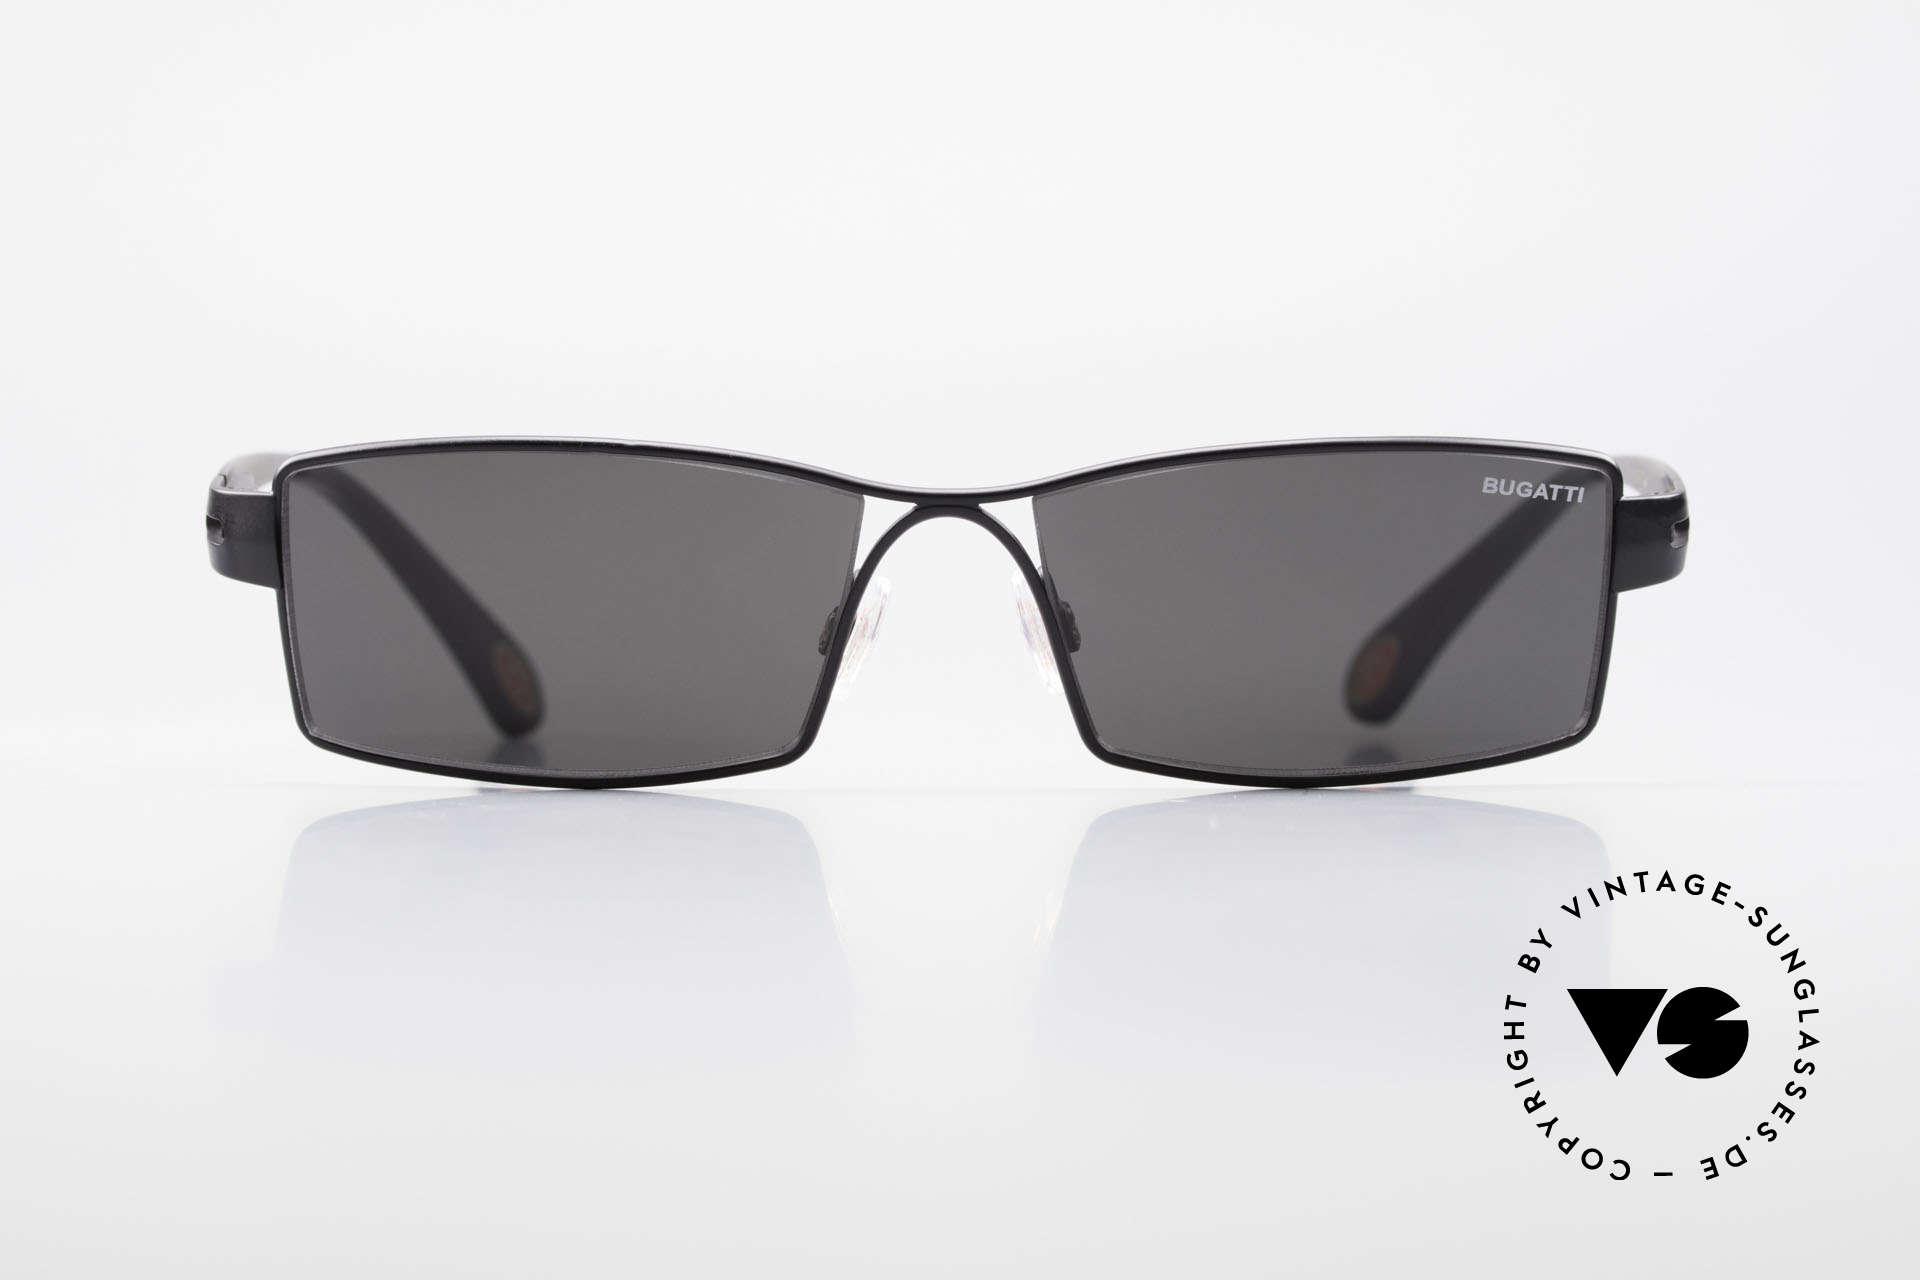 Bugatti 499 Rare Designer Sunglasses XL, TOP-NOTCH quality of all frame components, Made for Men